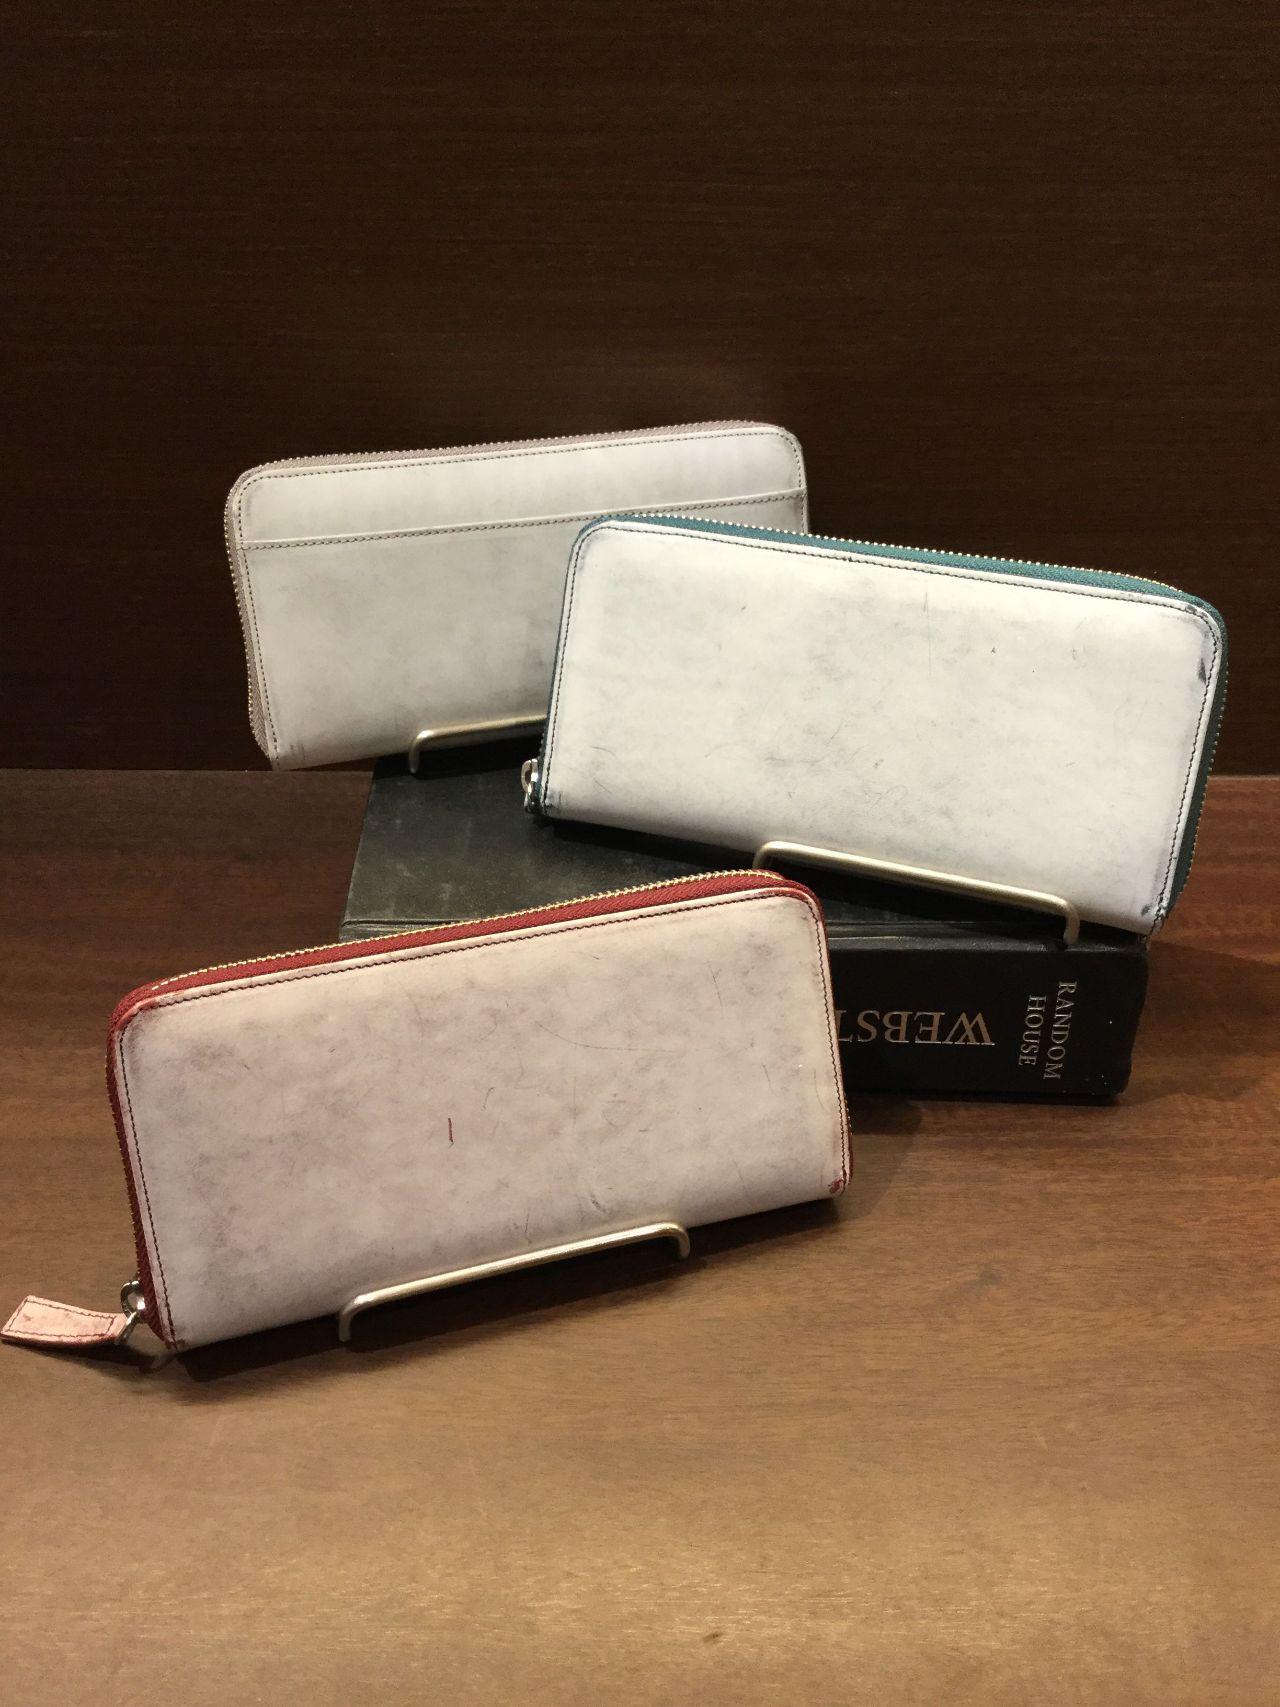 a7a595f3f624 お洒落 メンズ財布 | ikka LOUNGE mozoワンダーシティ店 | コックス(COX ...